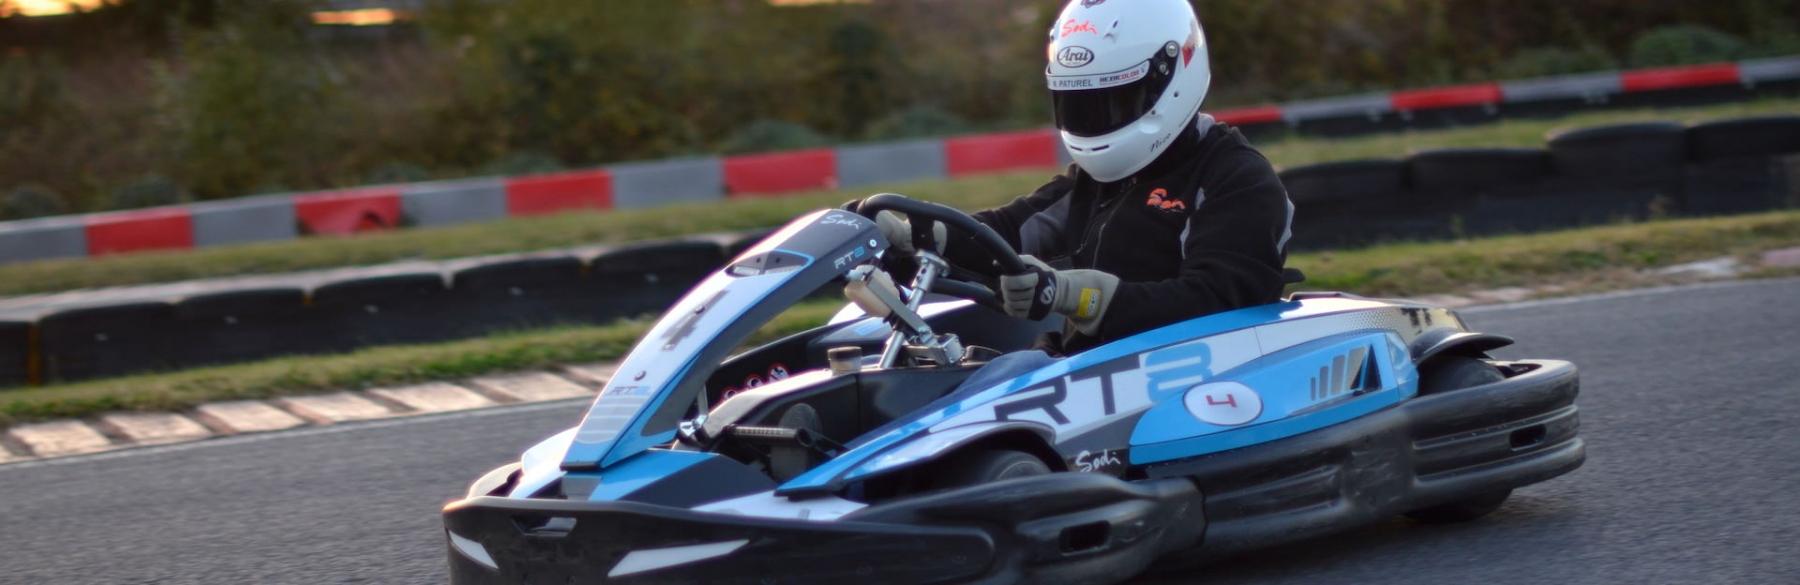 kart-adulte-outdoor-karting-nantes_w1920